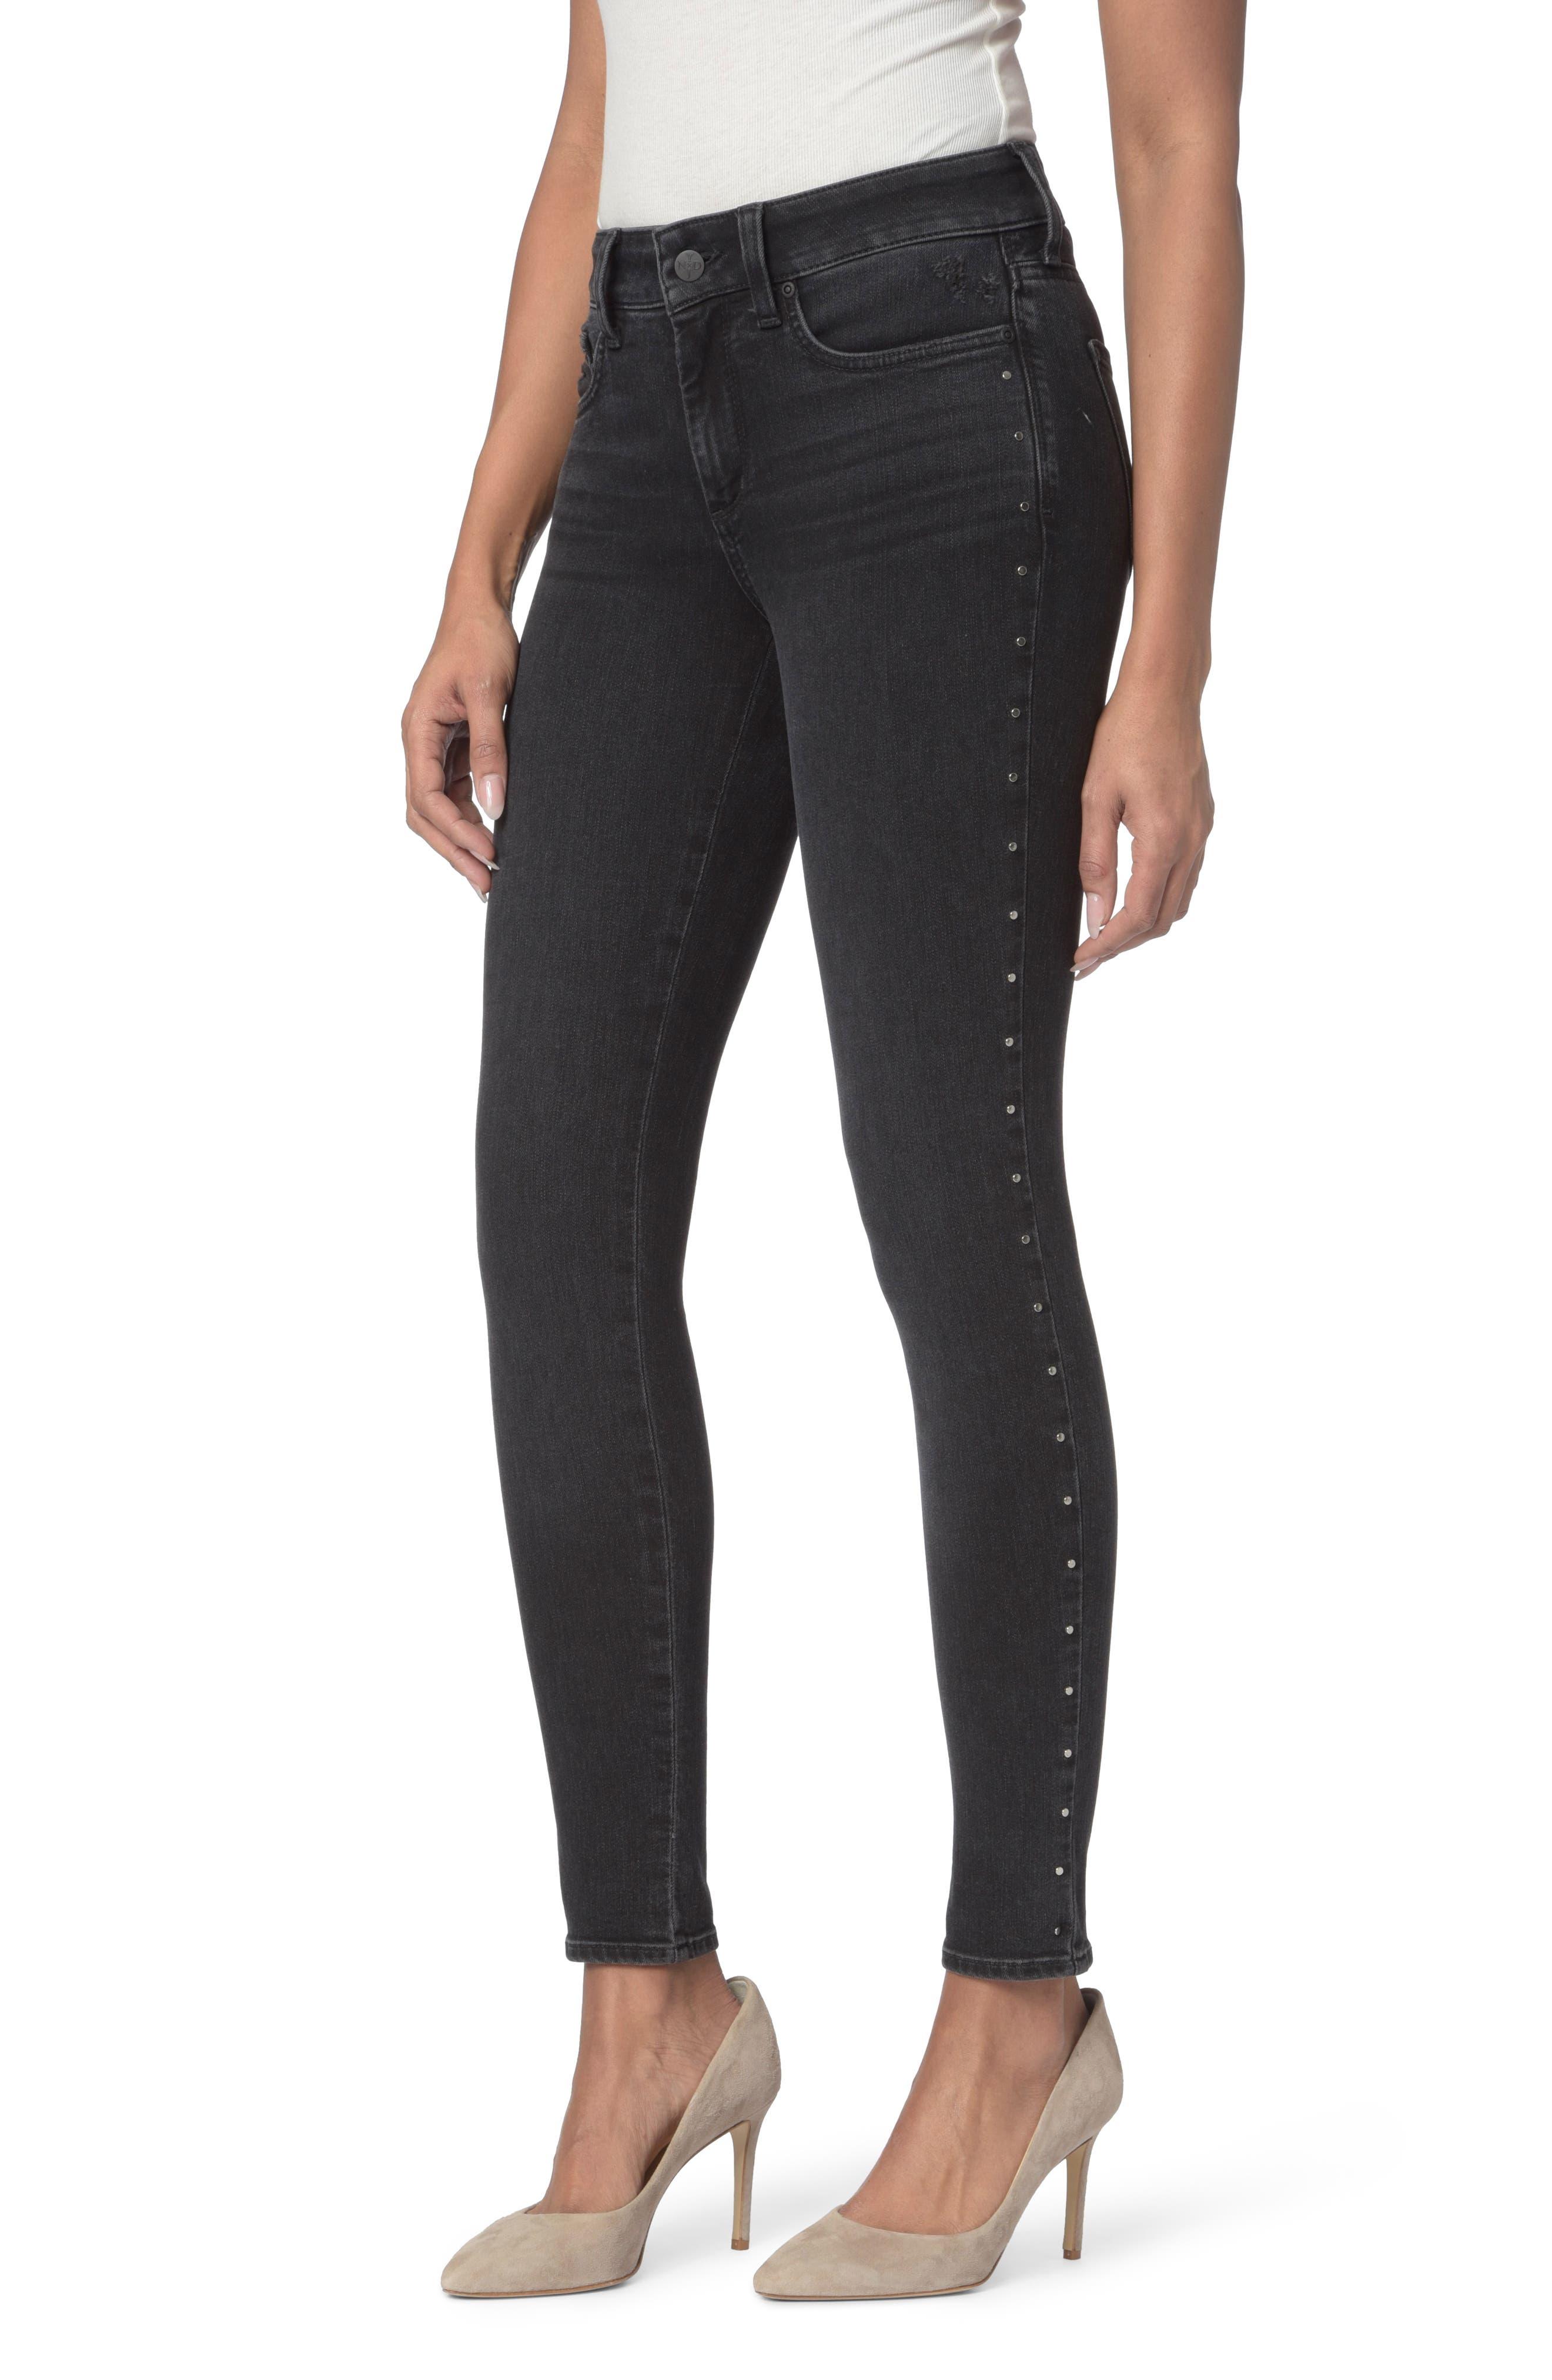 Main Image - NYDJ Ami Embellished Stretch Skinny Jeans (Campaign) (Regular & Petite)